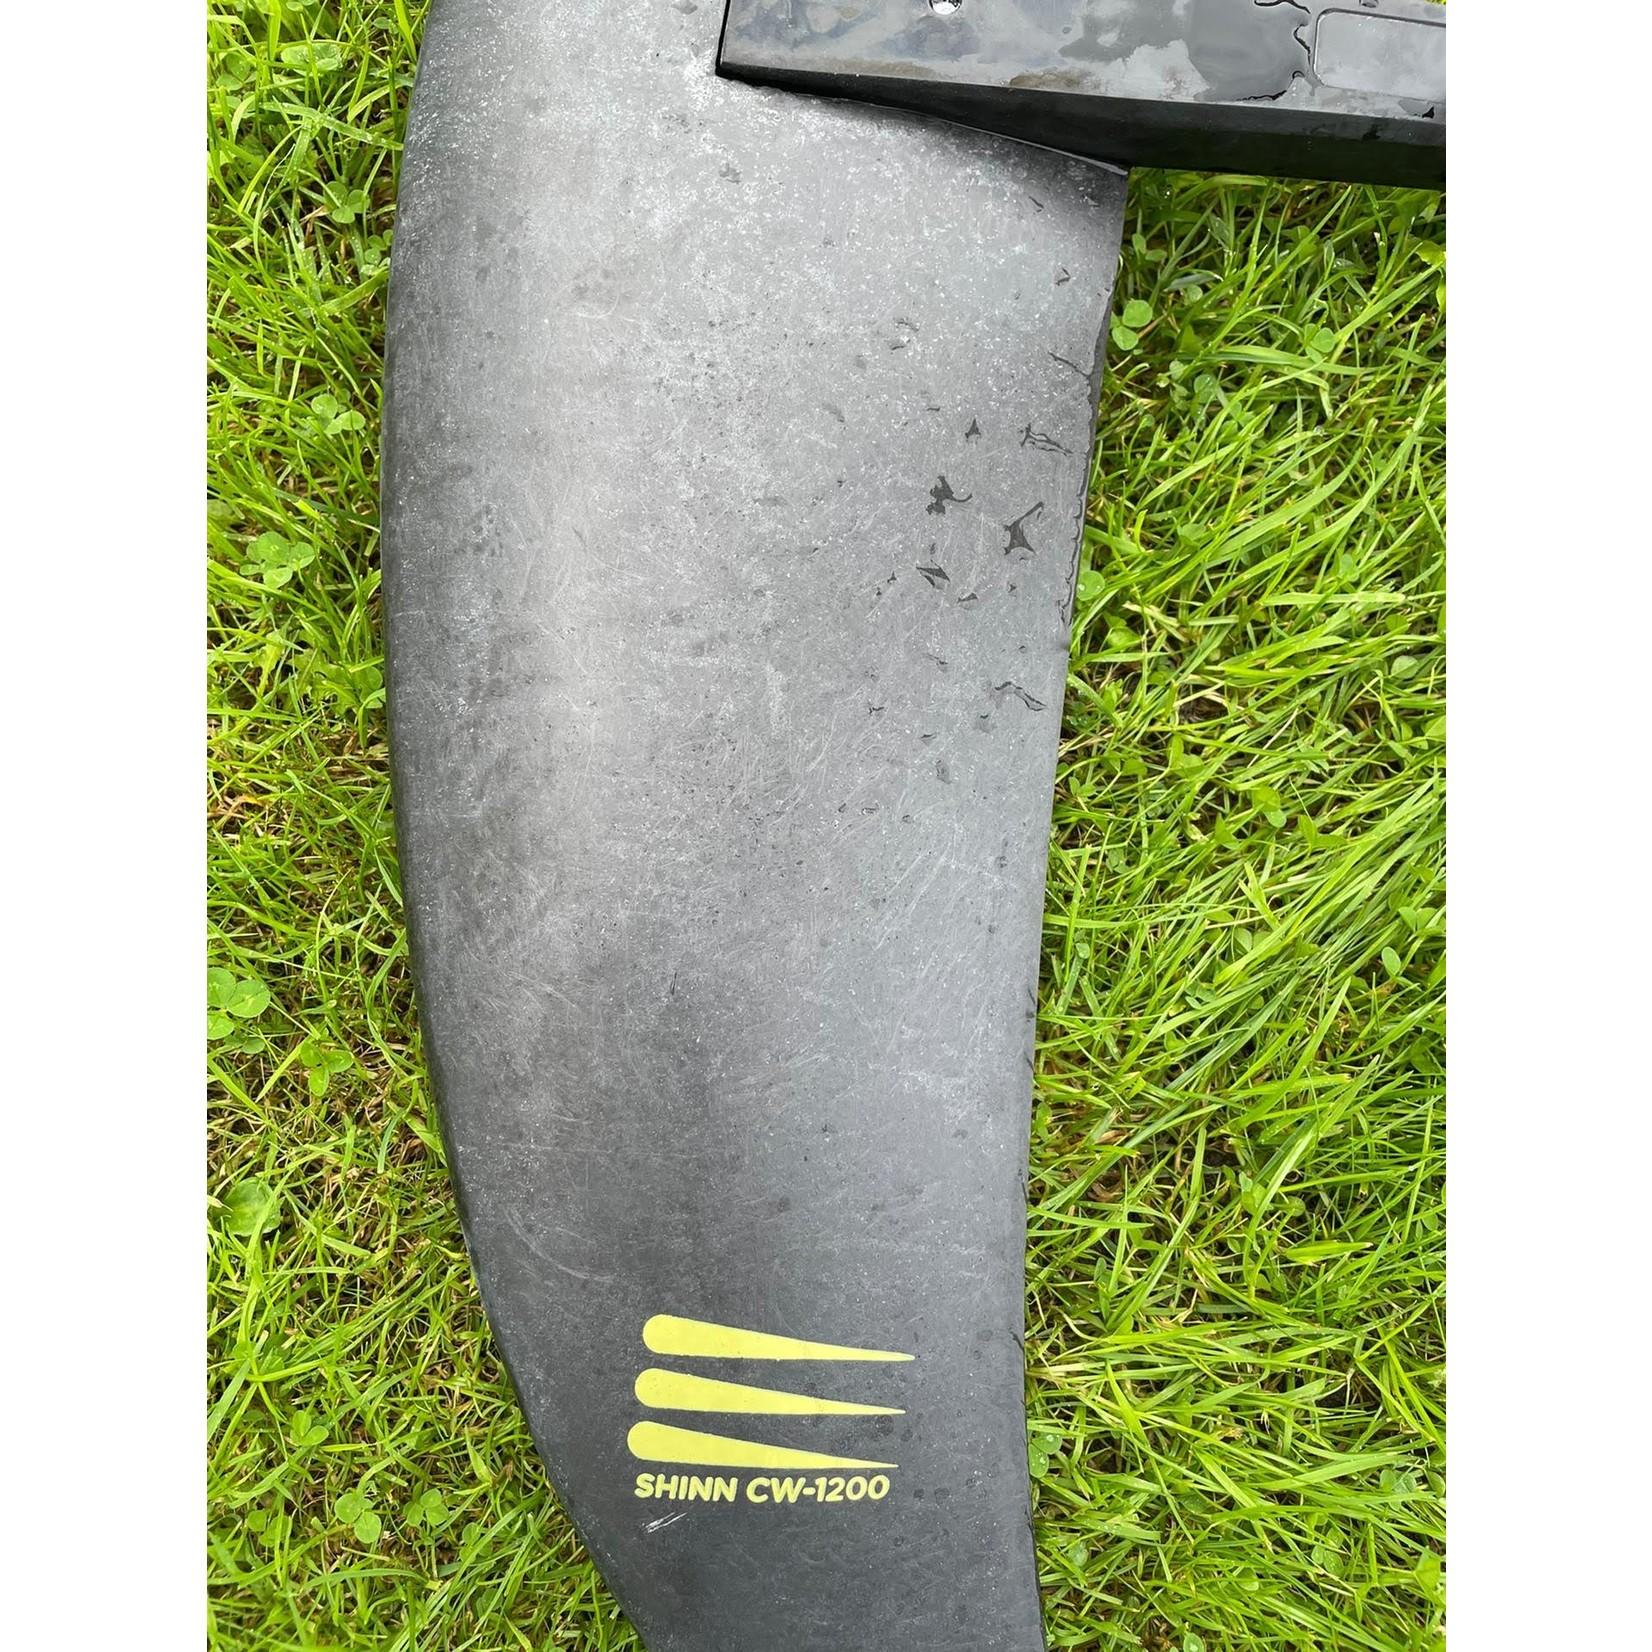 Shinn Pre Loved Suprahydro MD Carbon 1200 set